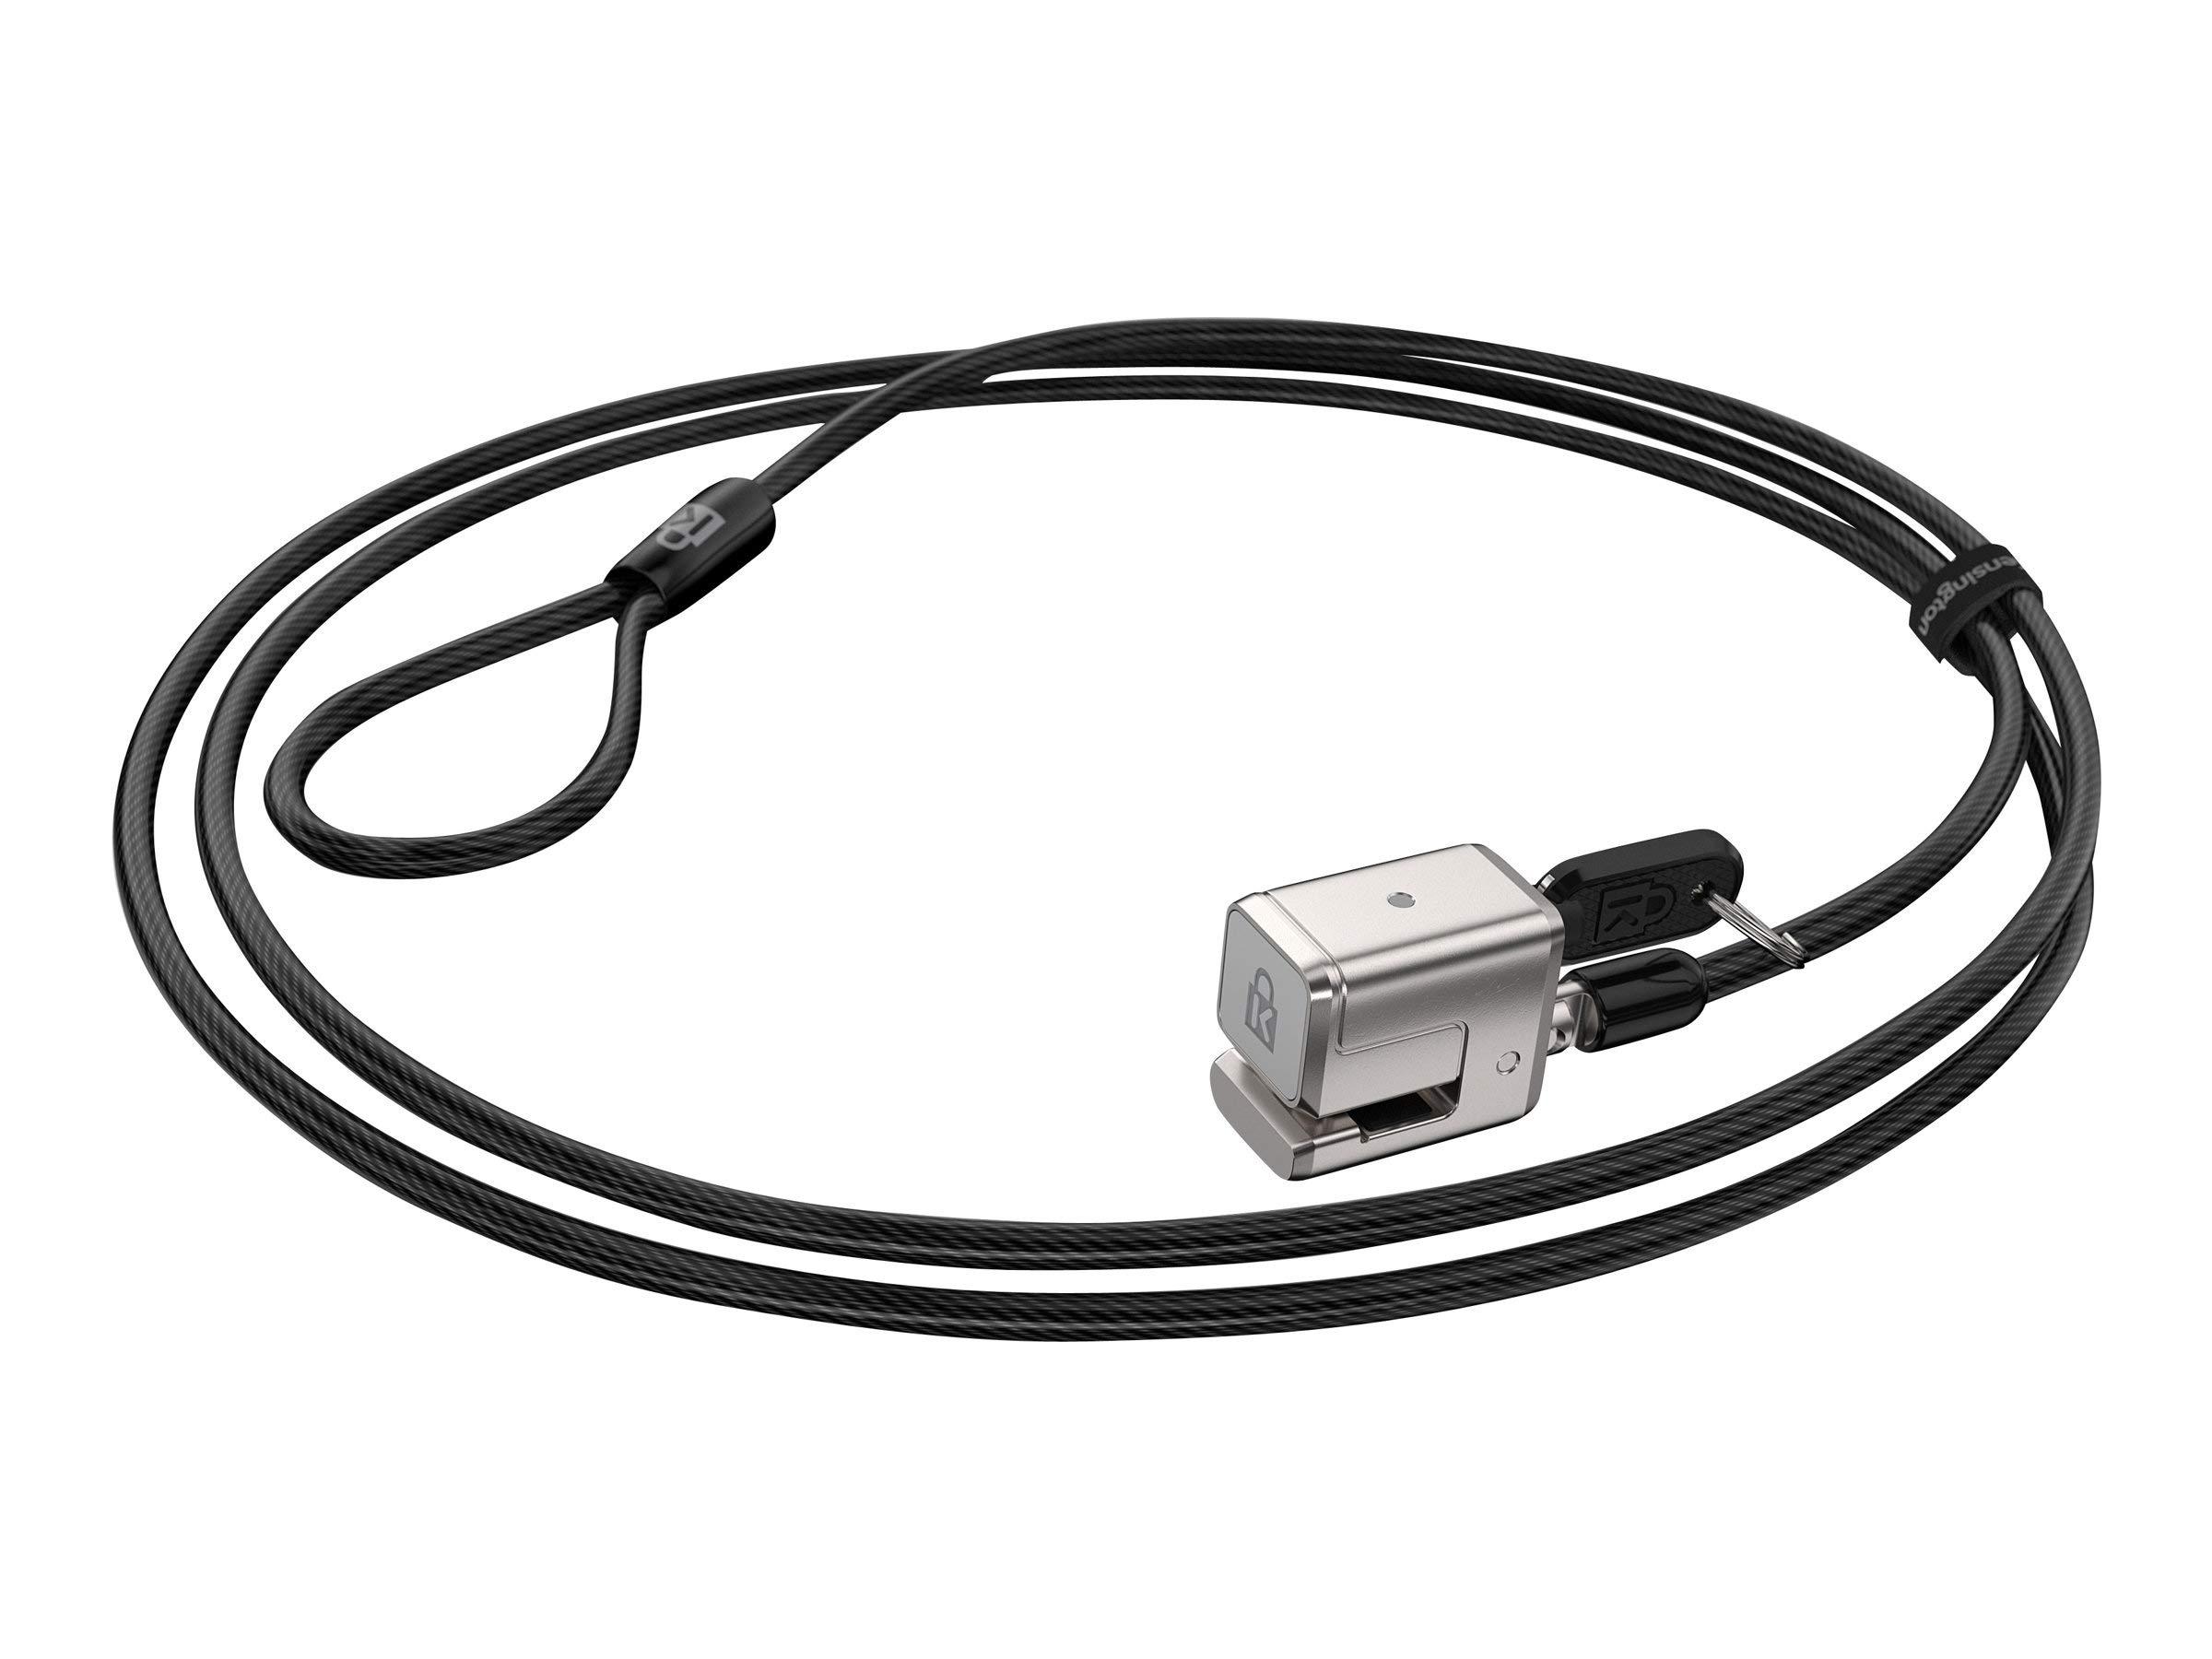 Kensington Keyed Cable, Black (K62052)